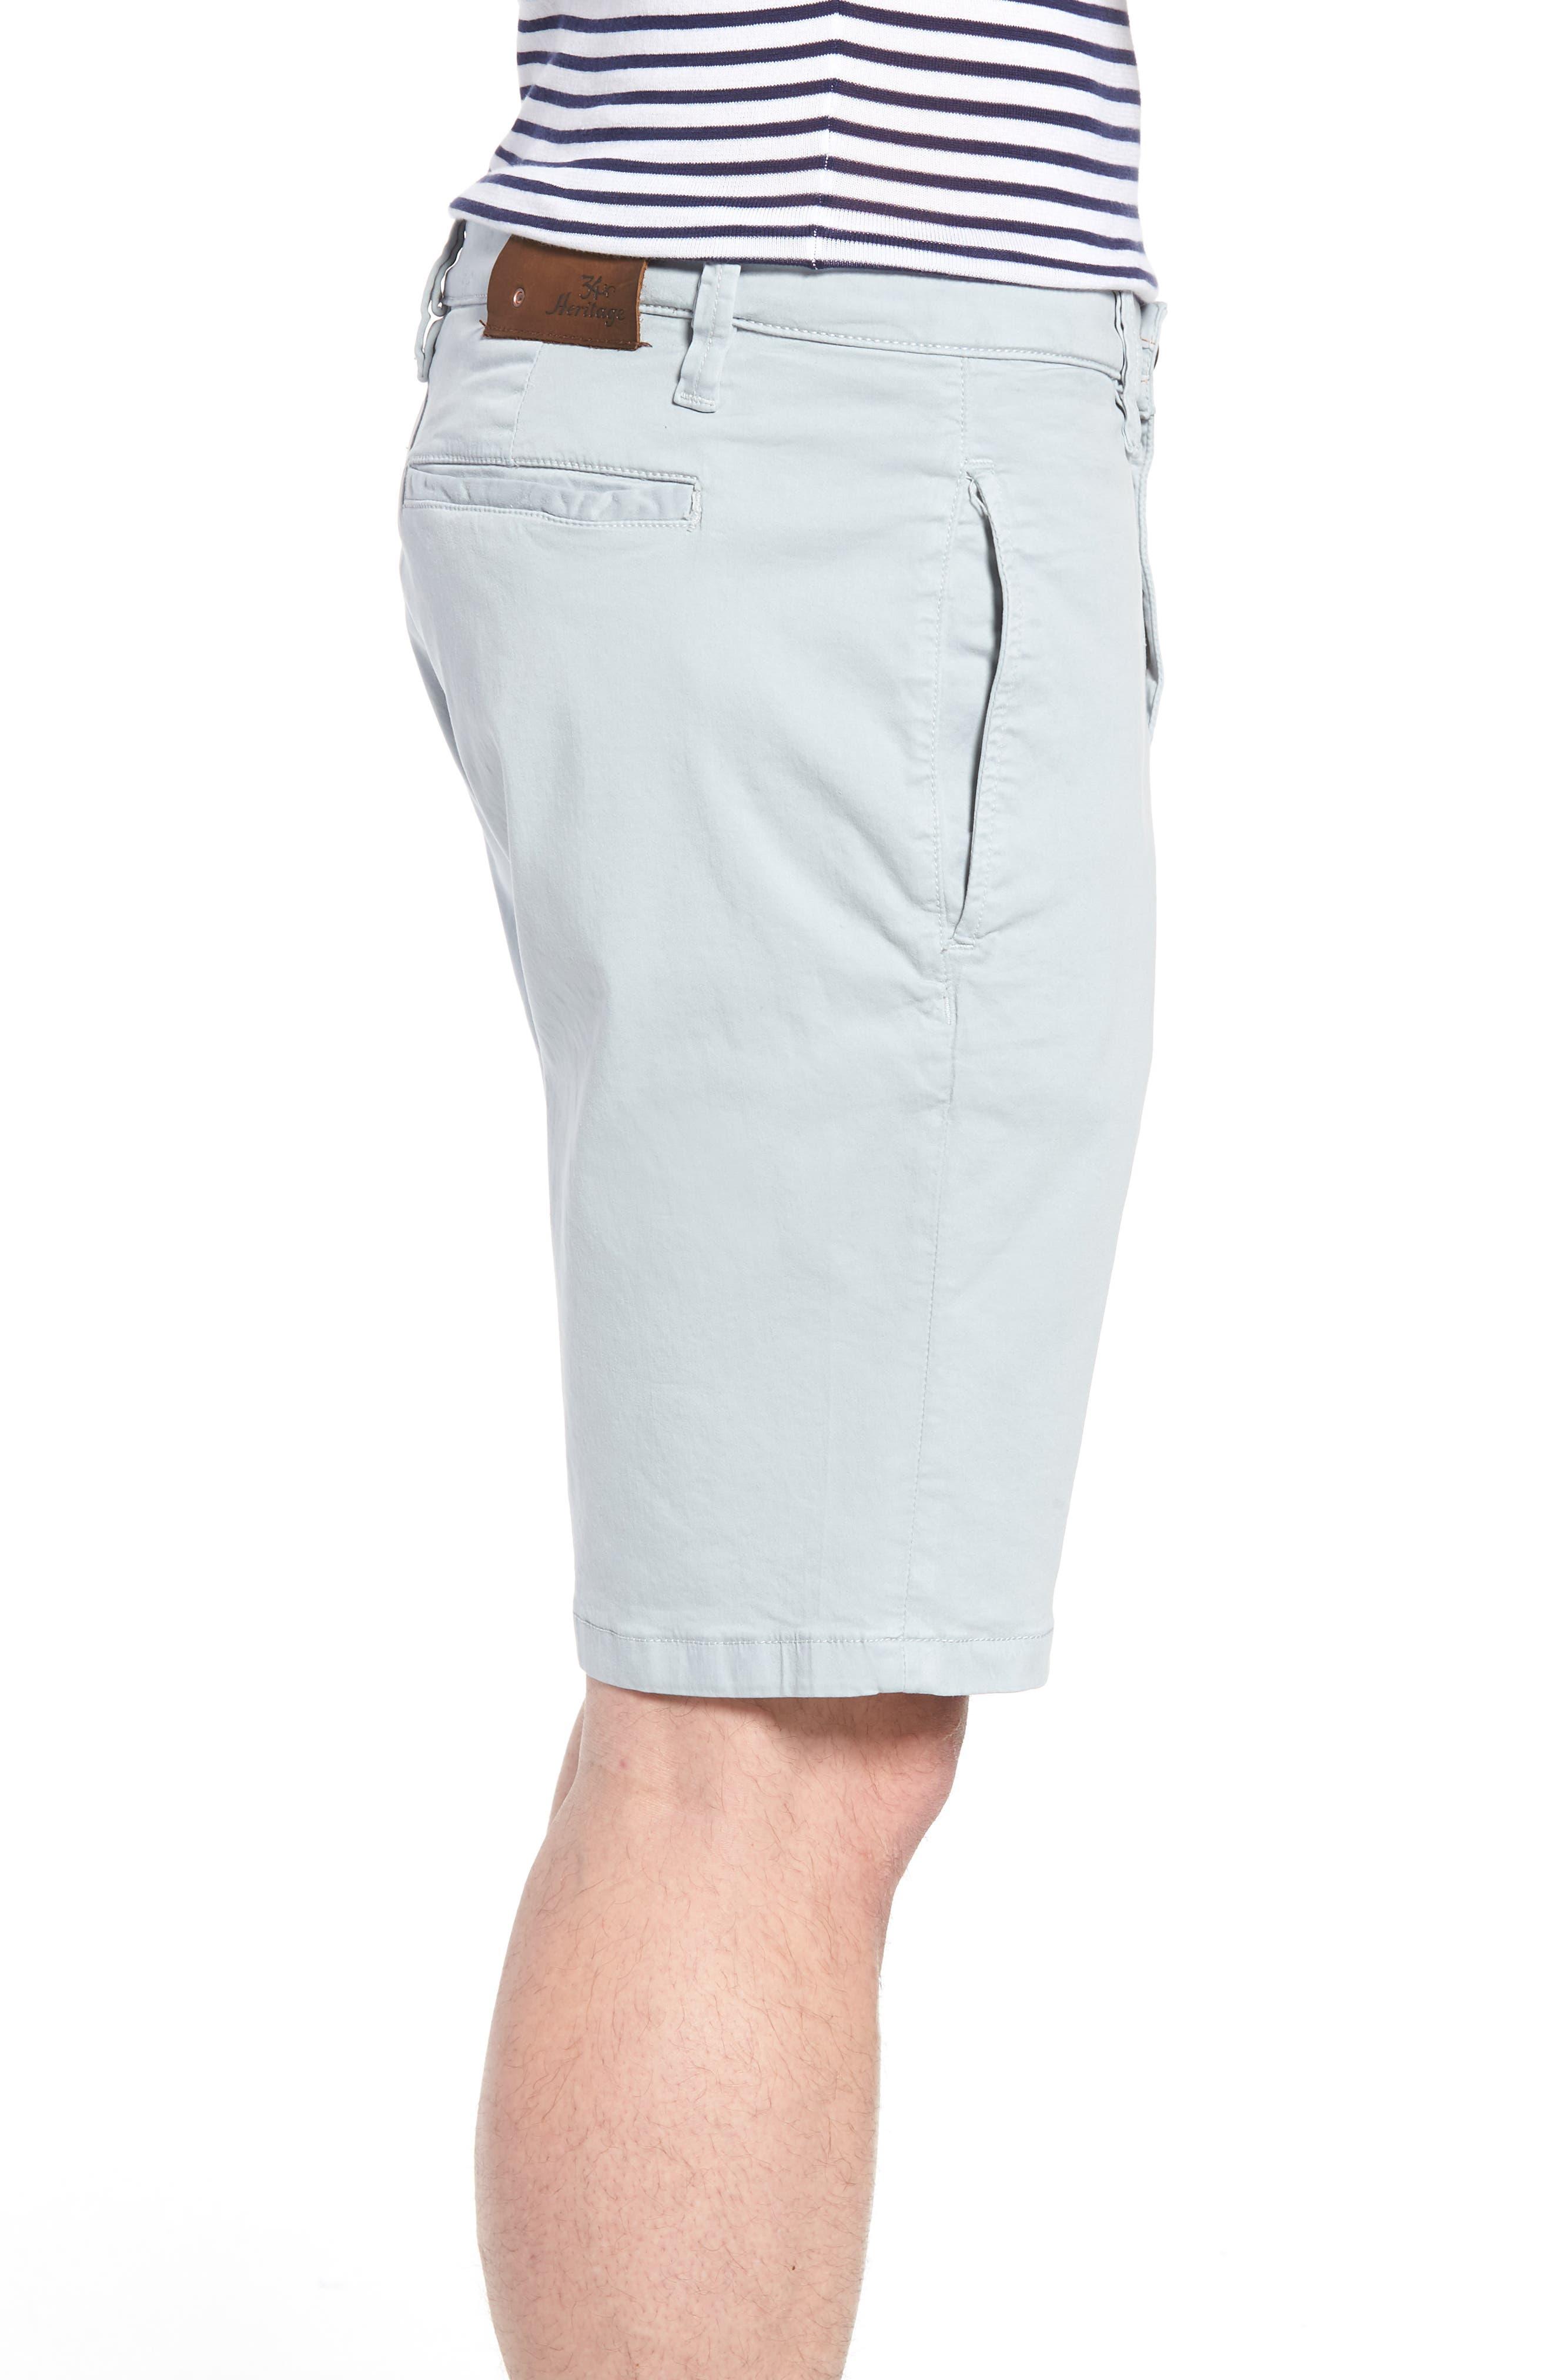 Nevada Twill Shorts,                             Alternate thumbnail 3, color,                             ICE TWILL